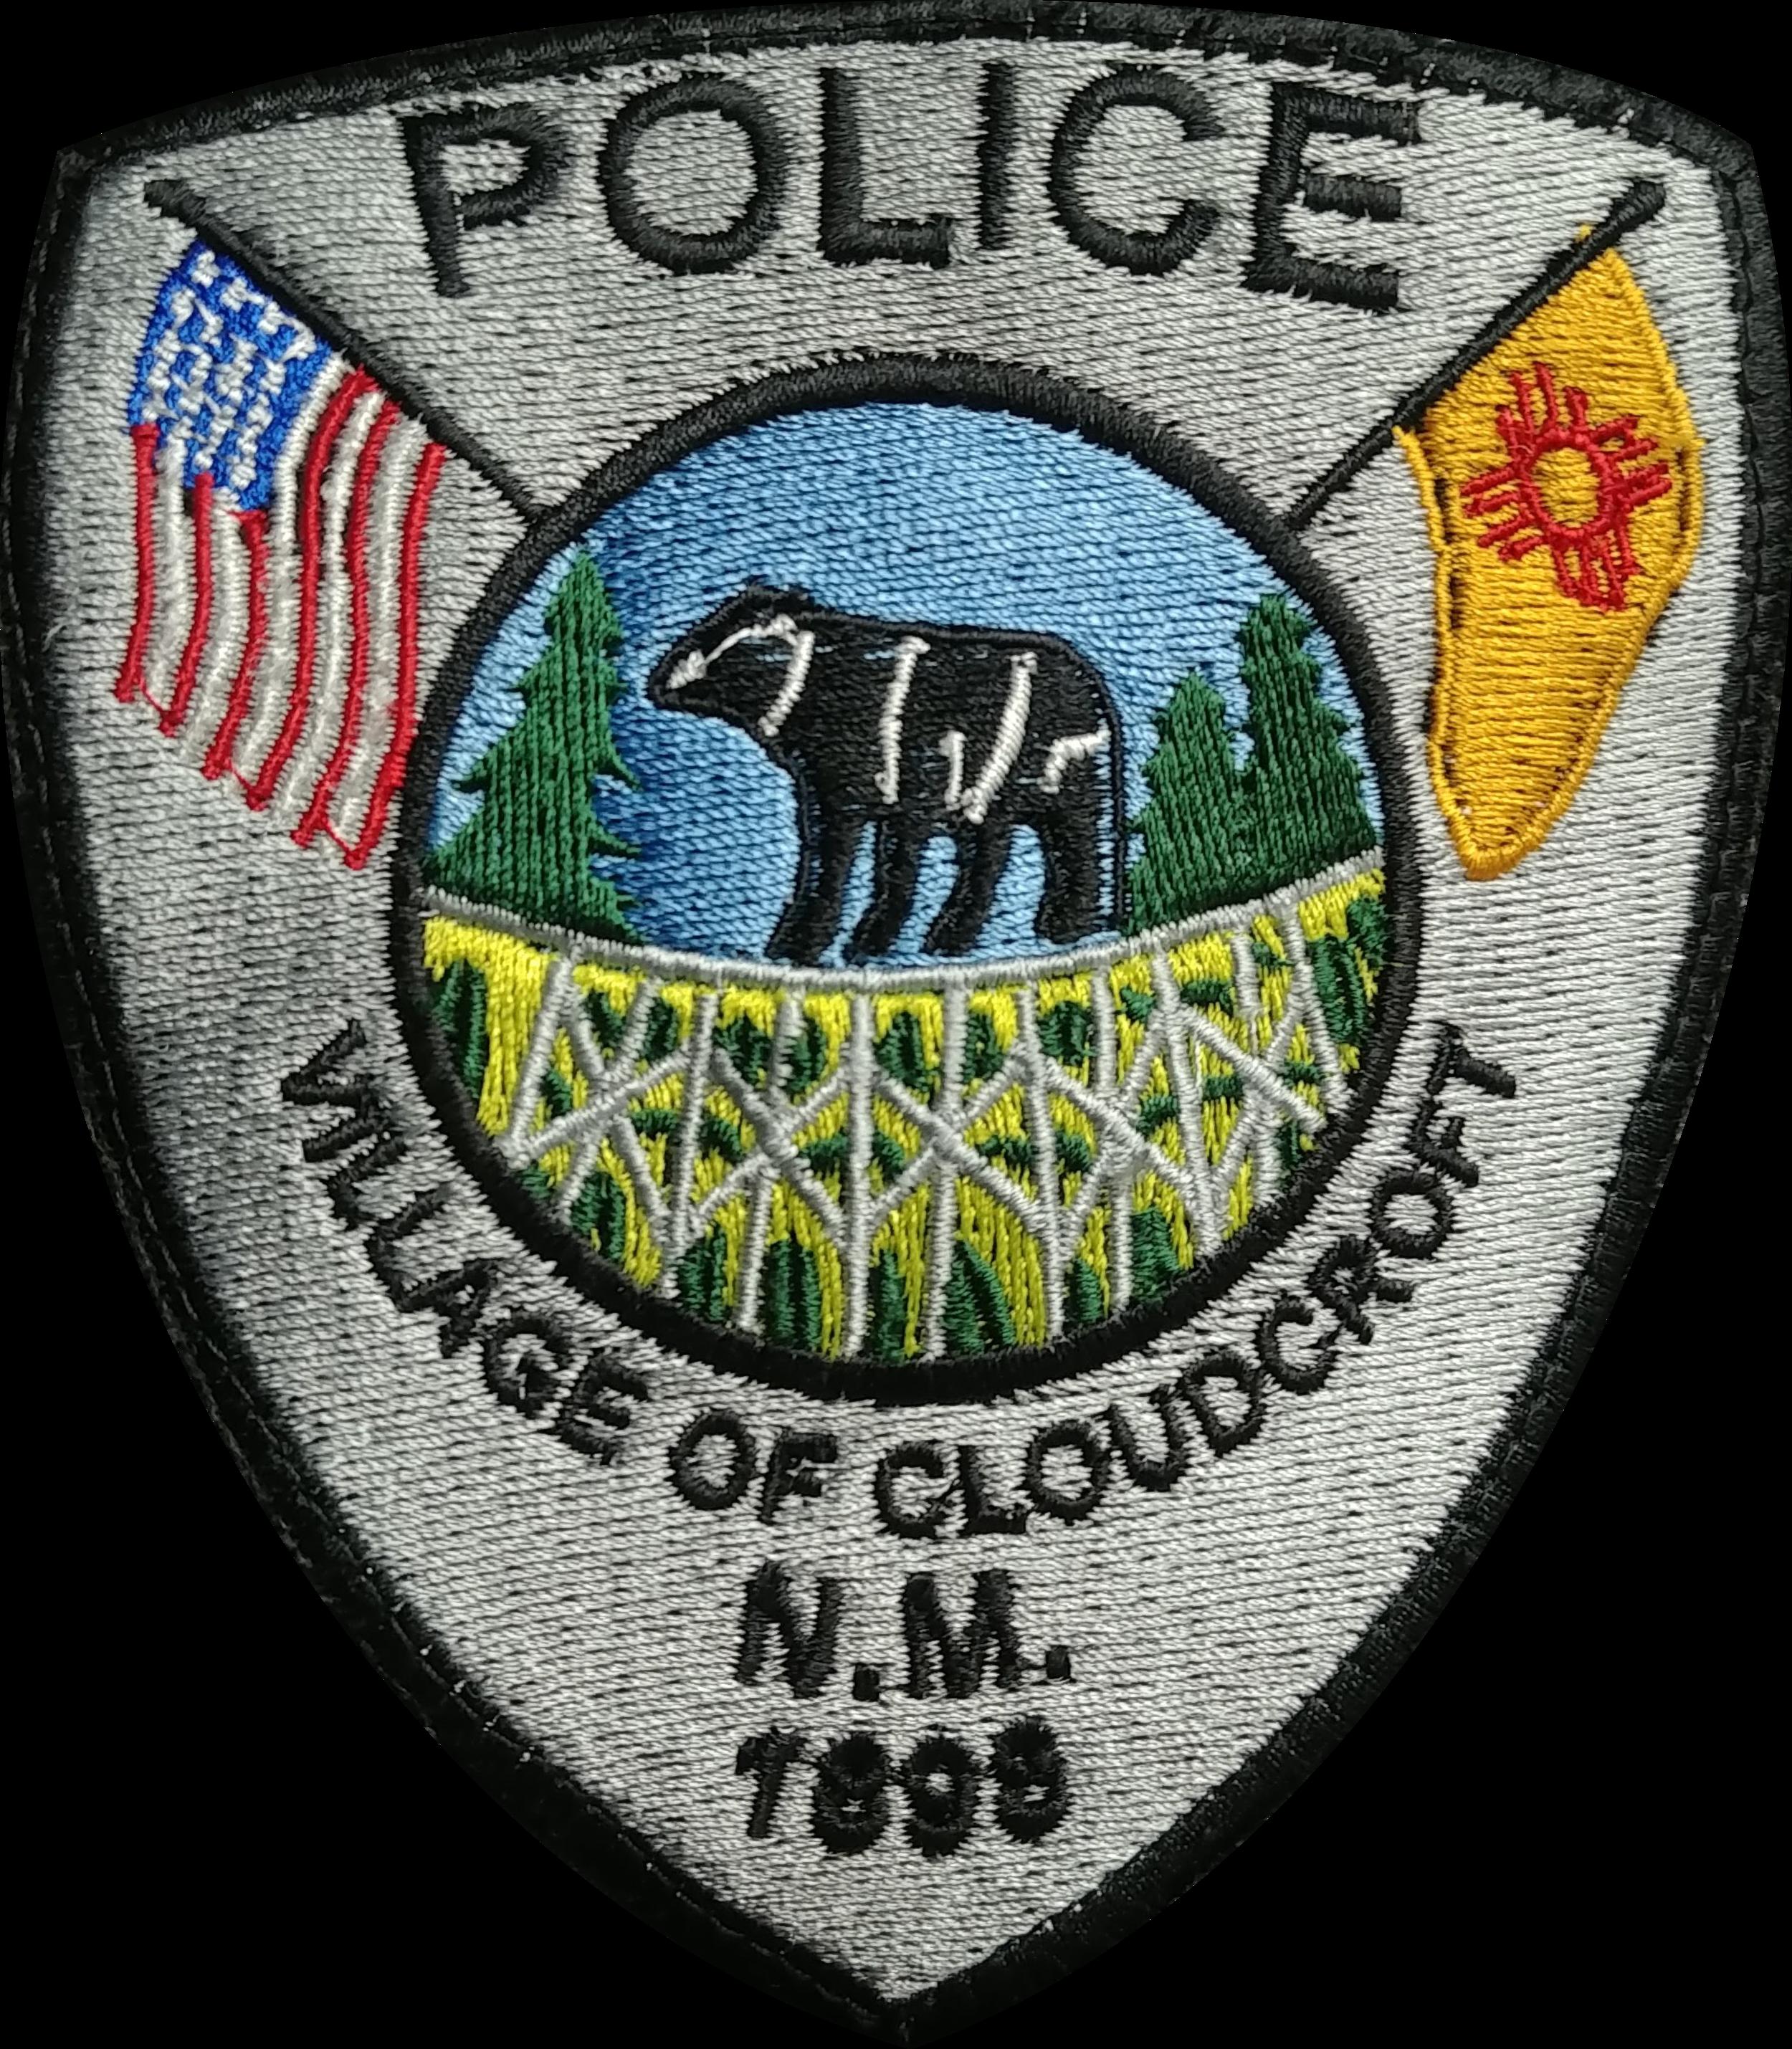 CloudcroftPoliceBadge-01-01.png